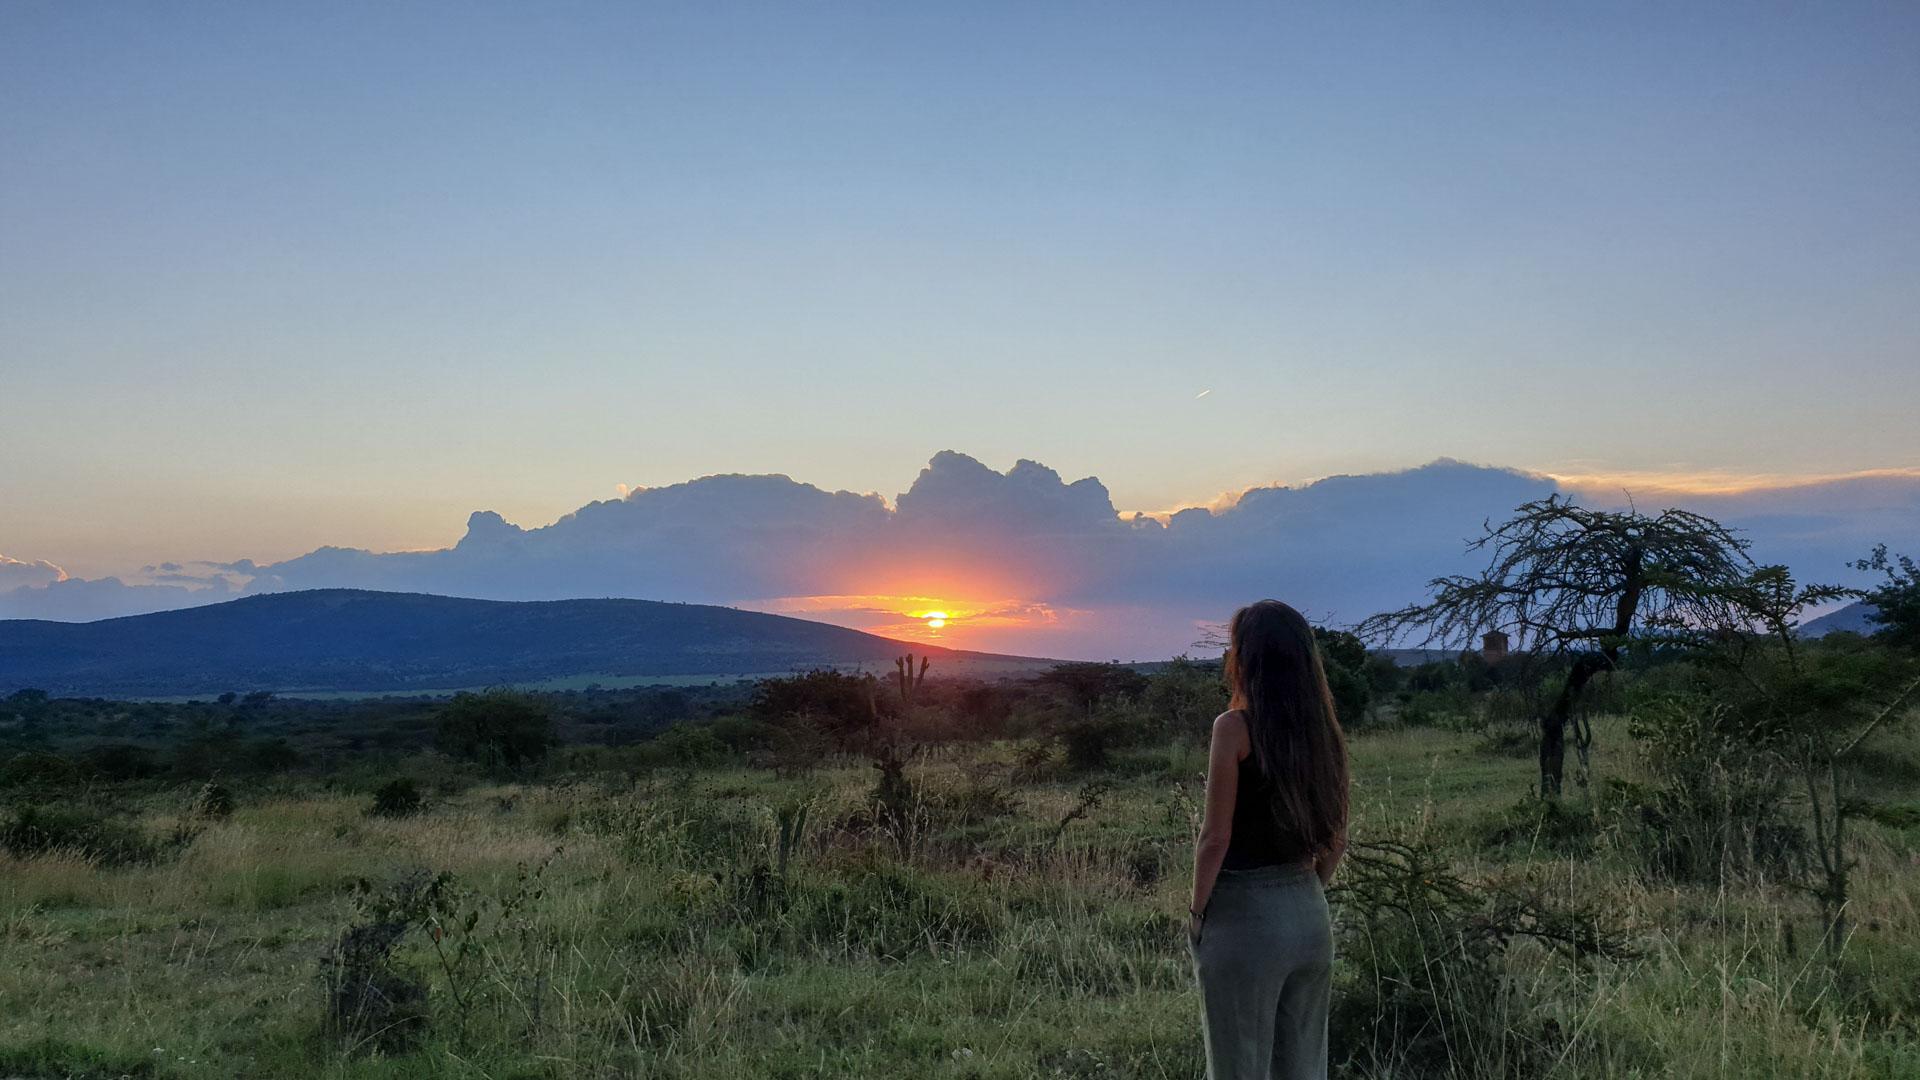 Atardecer en el Masai Mara, Kenia